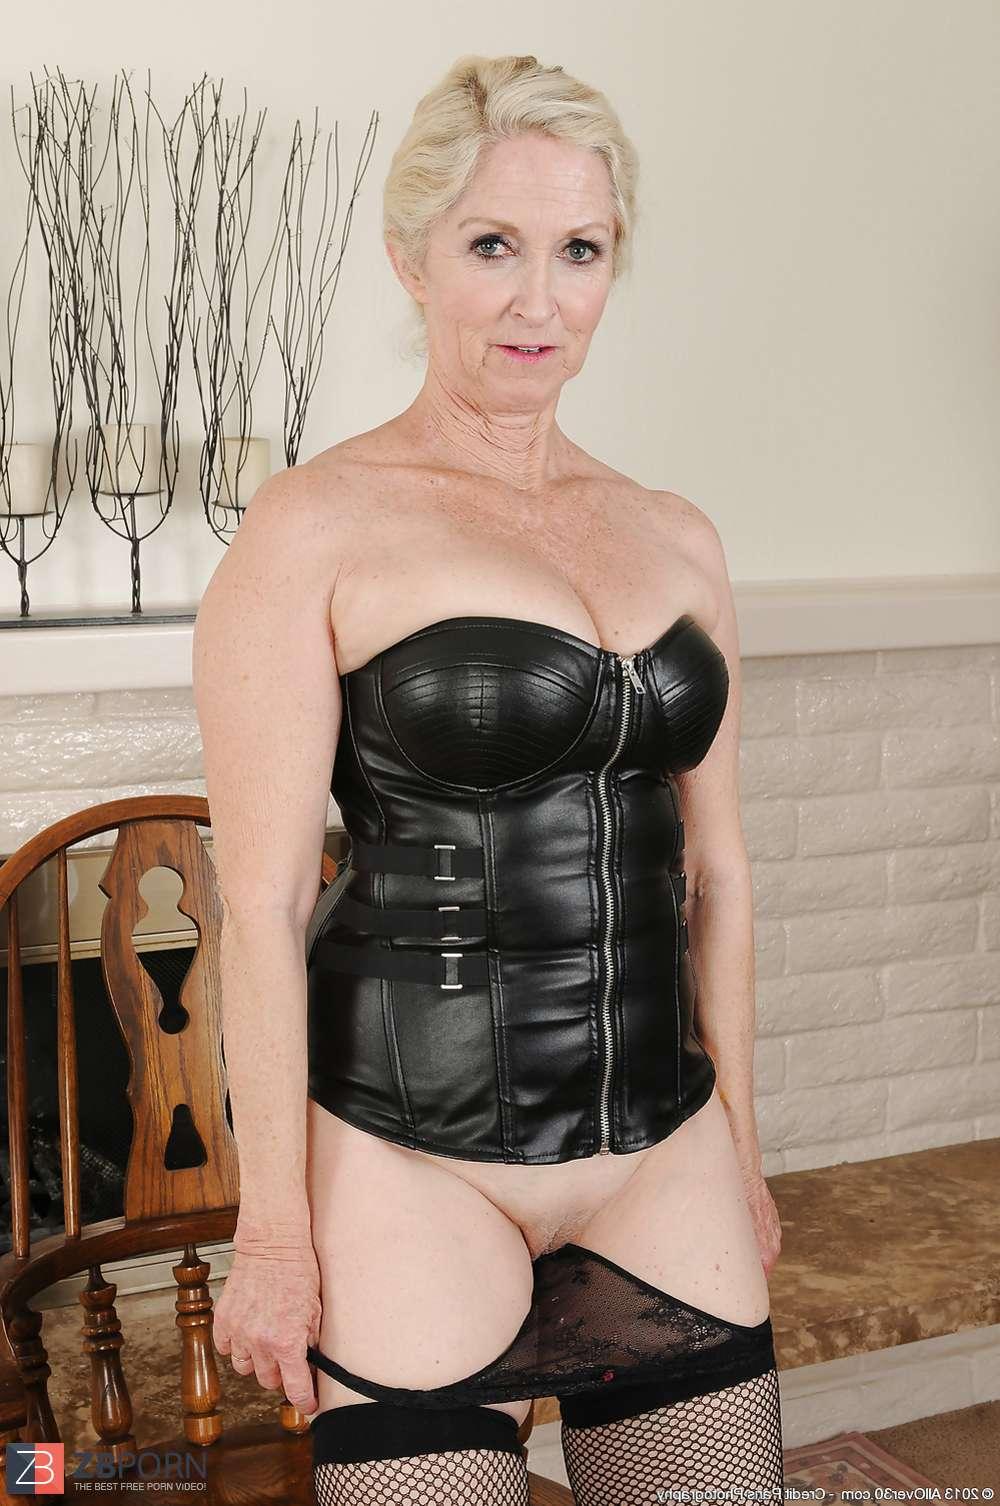 Warm Granny Leather Gimp  Zb Porn-9638